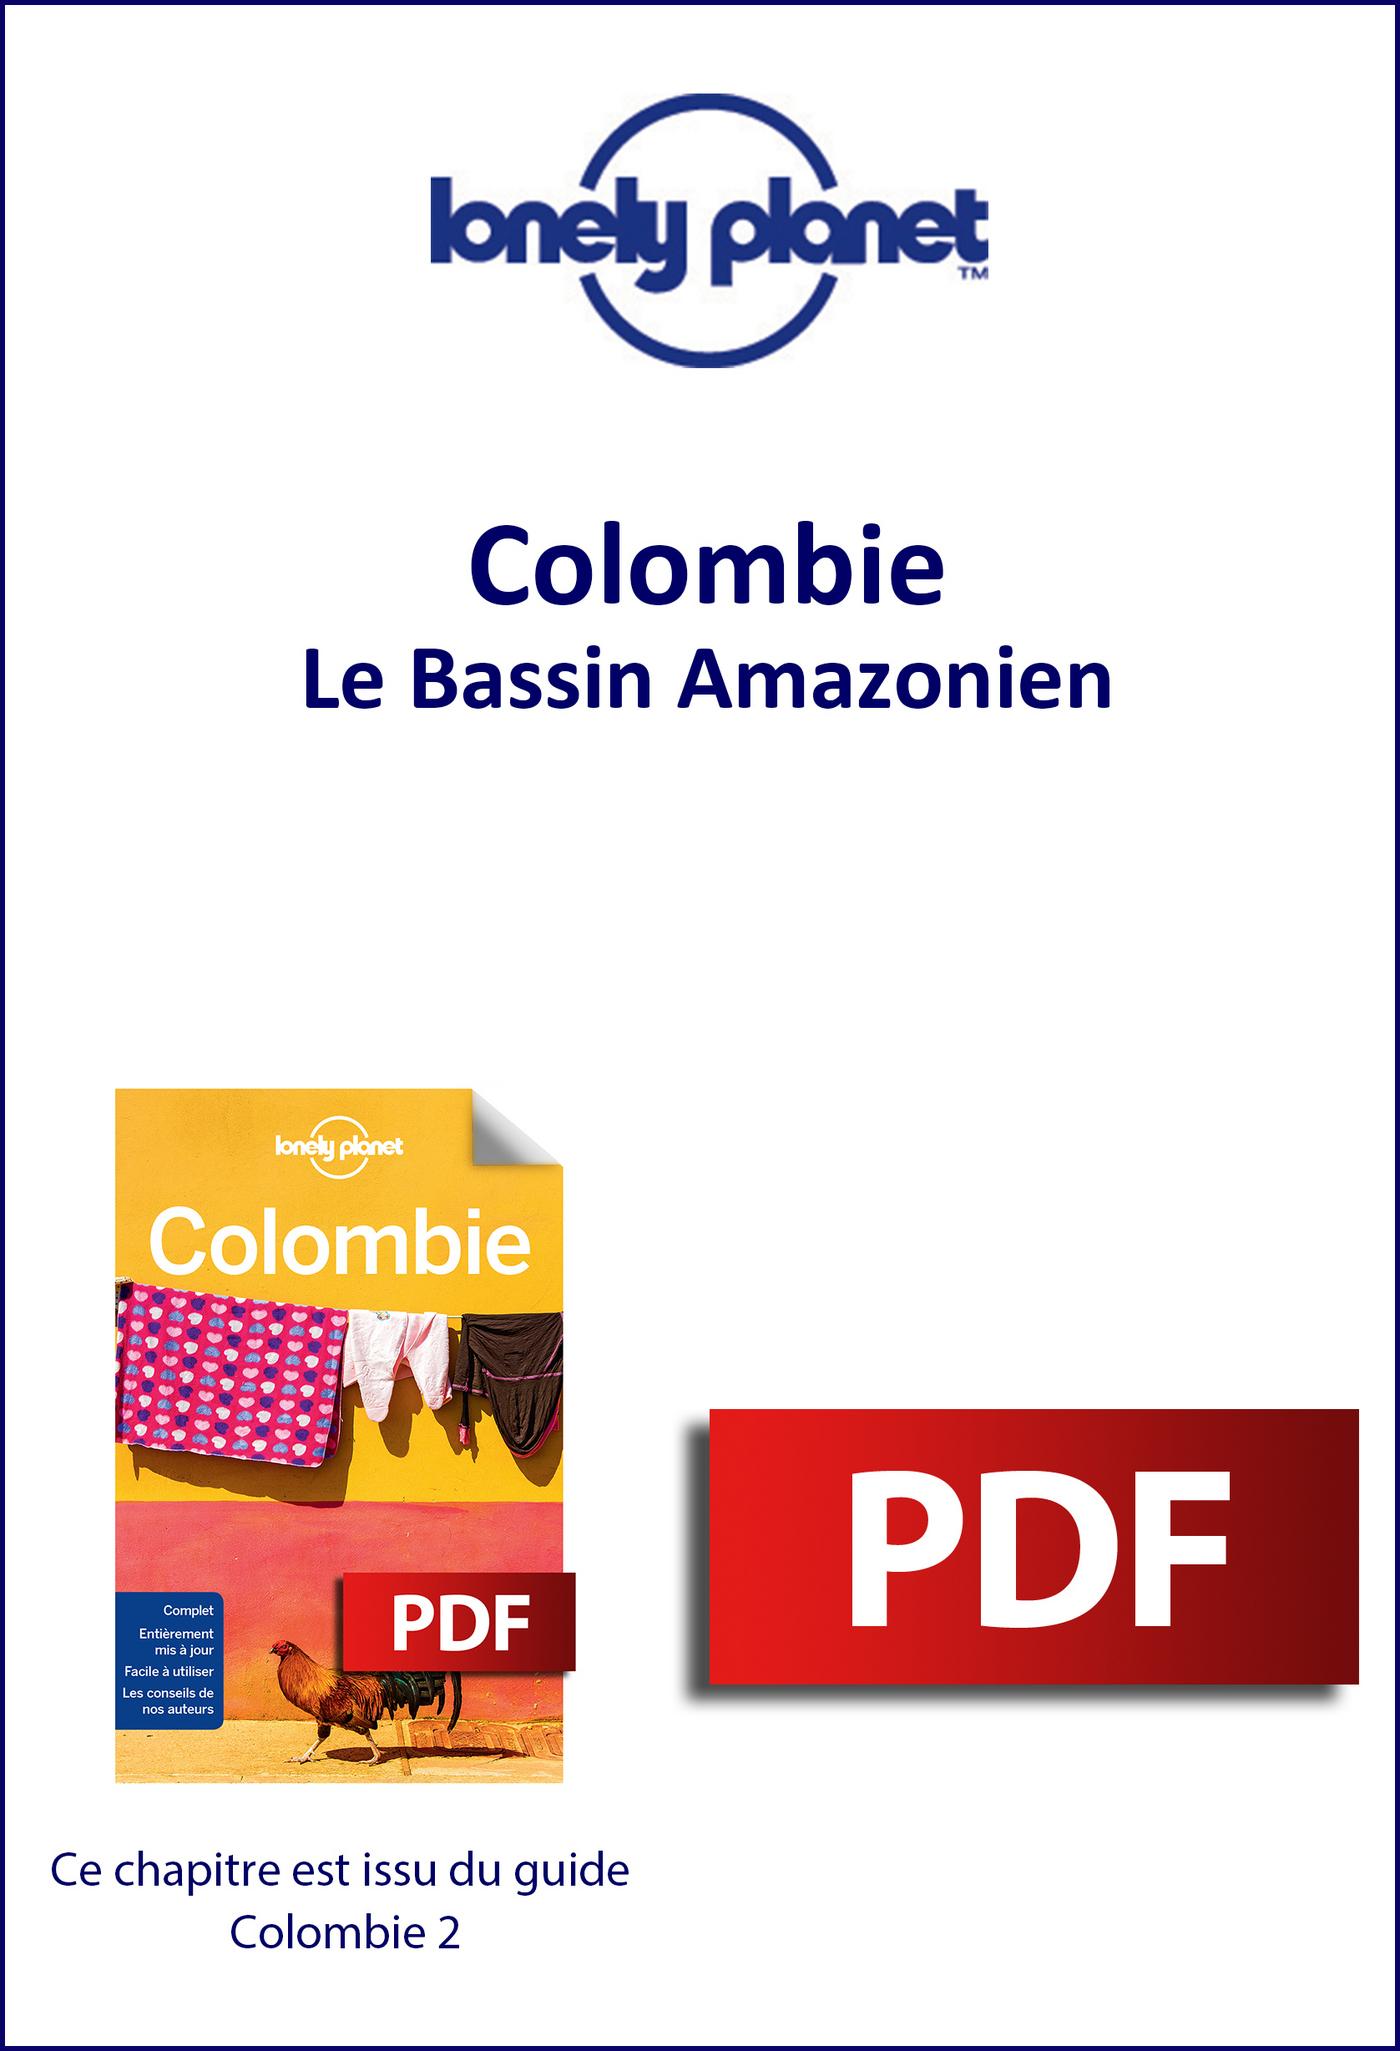 Colombie - Le Bassin Amazonien